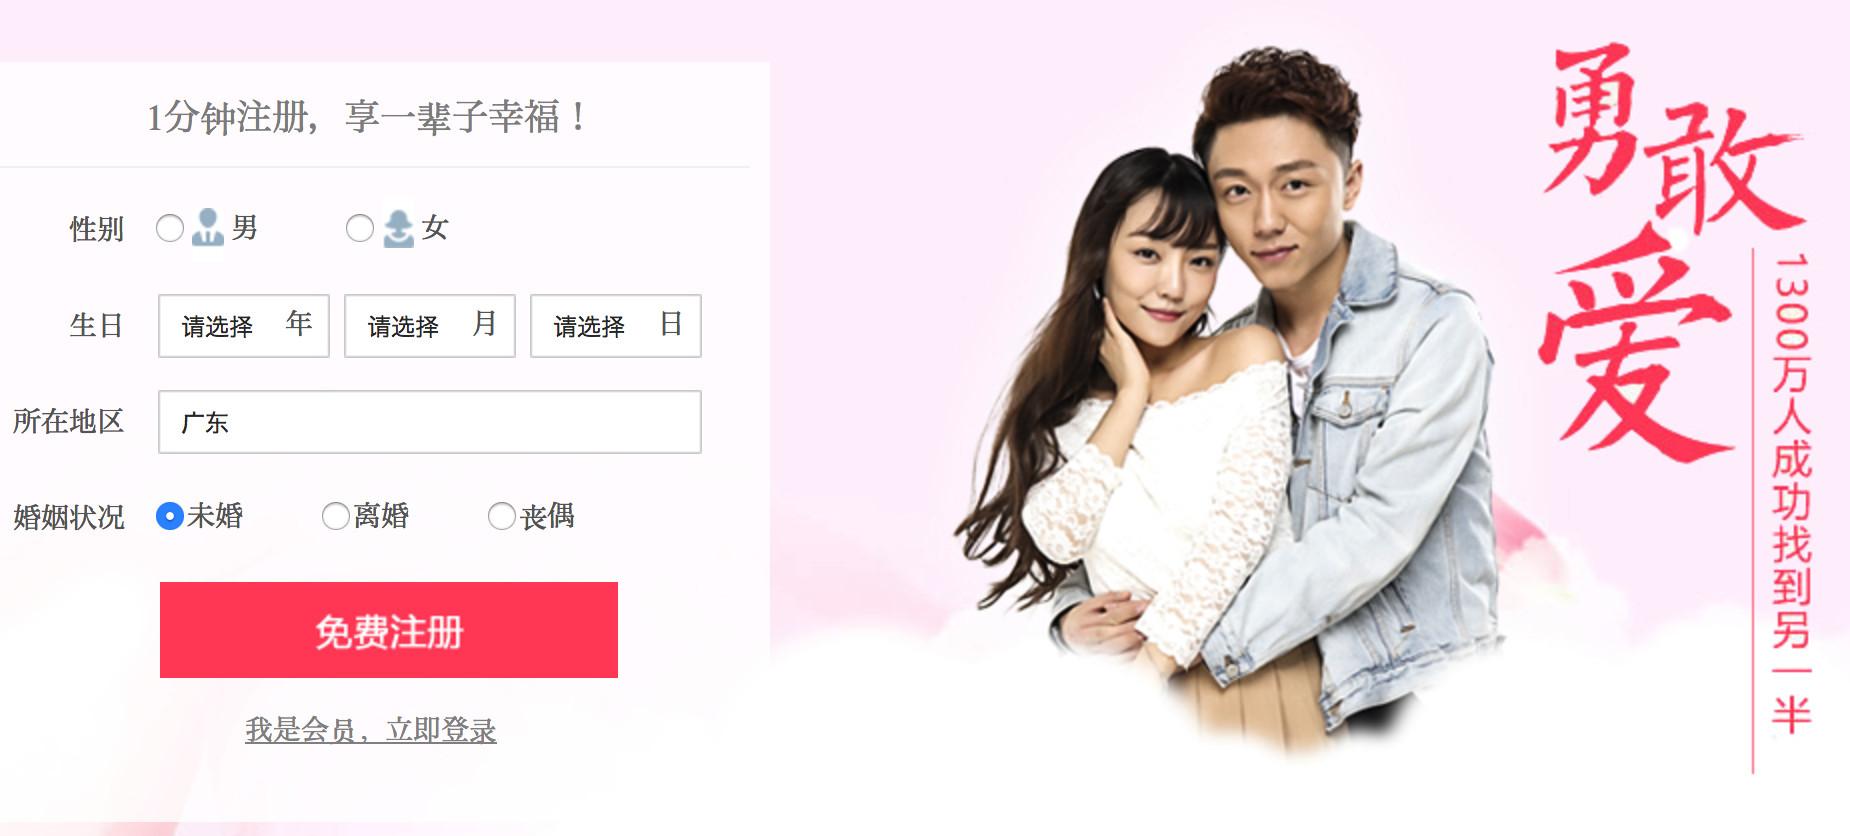 Dating China